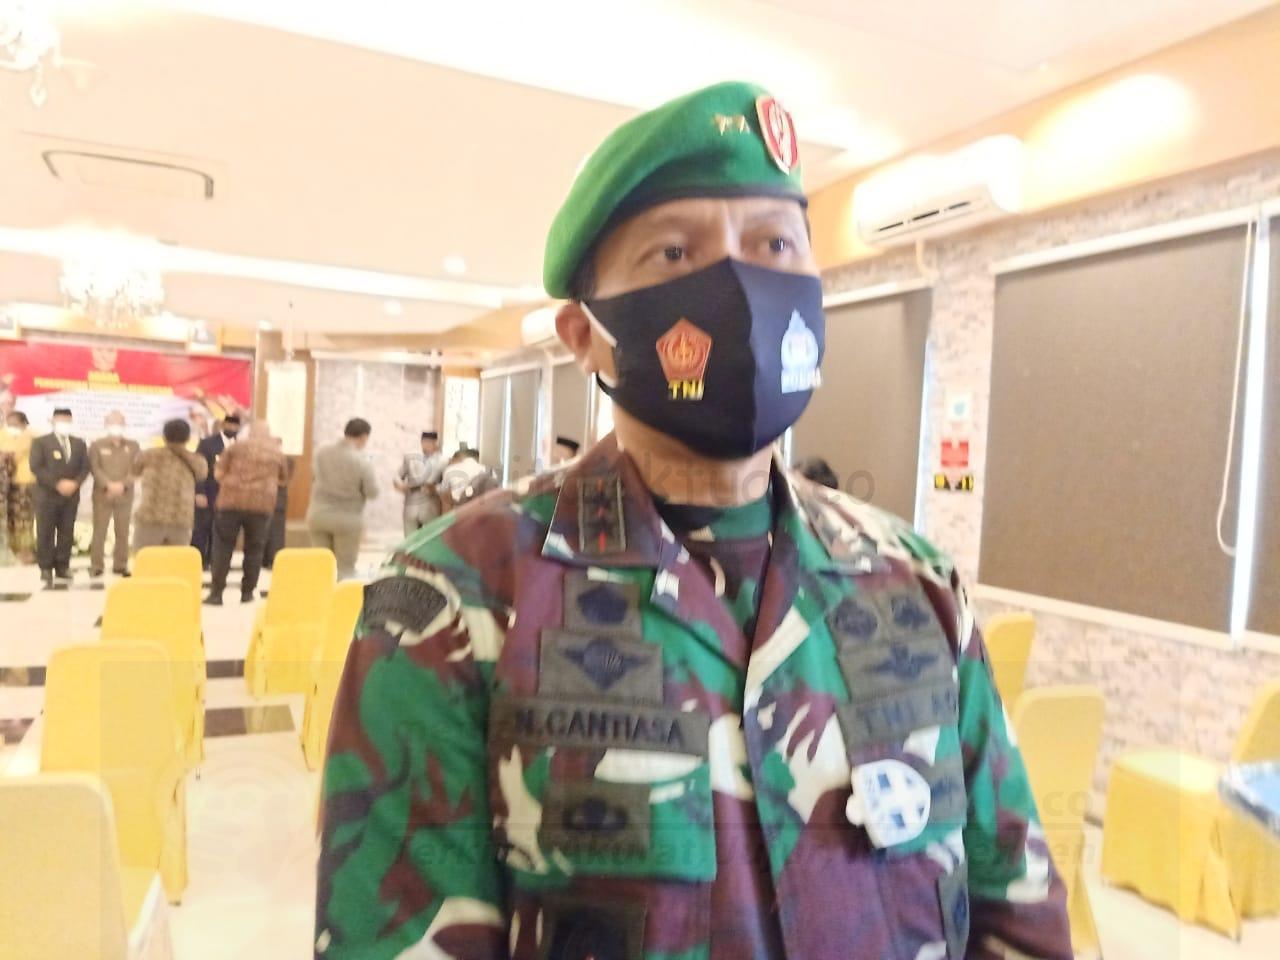 Pangdam XVIII Kasuari: Minggu Besok, 40 Kowad Berangkat Ikut Pendidikan di Bandung 1 IMG 20200926 WA0043